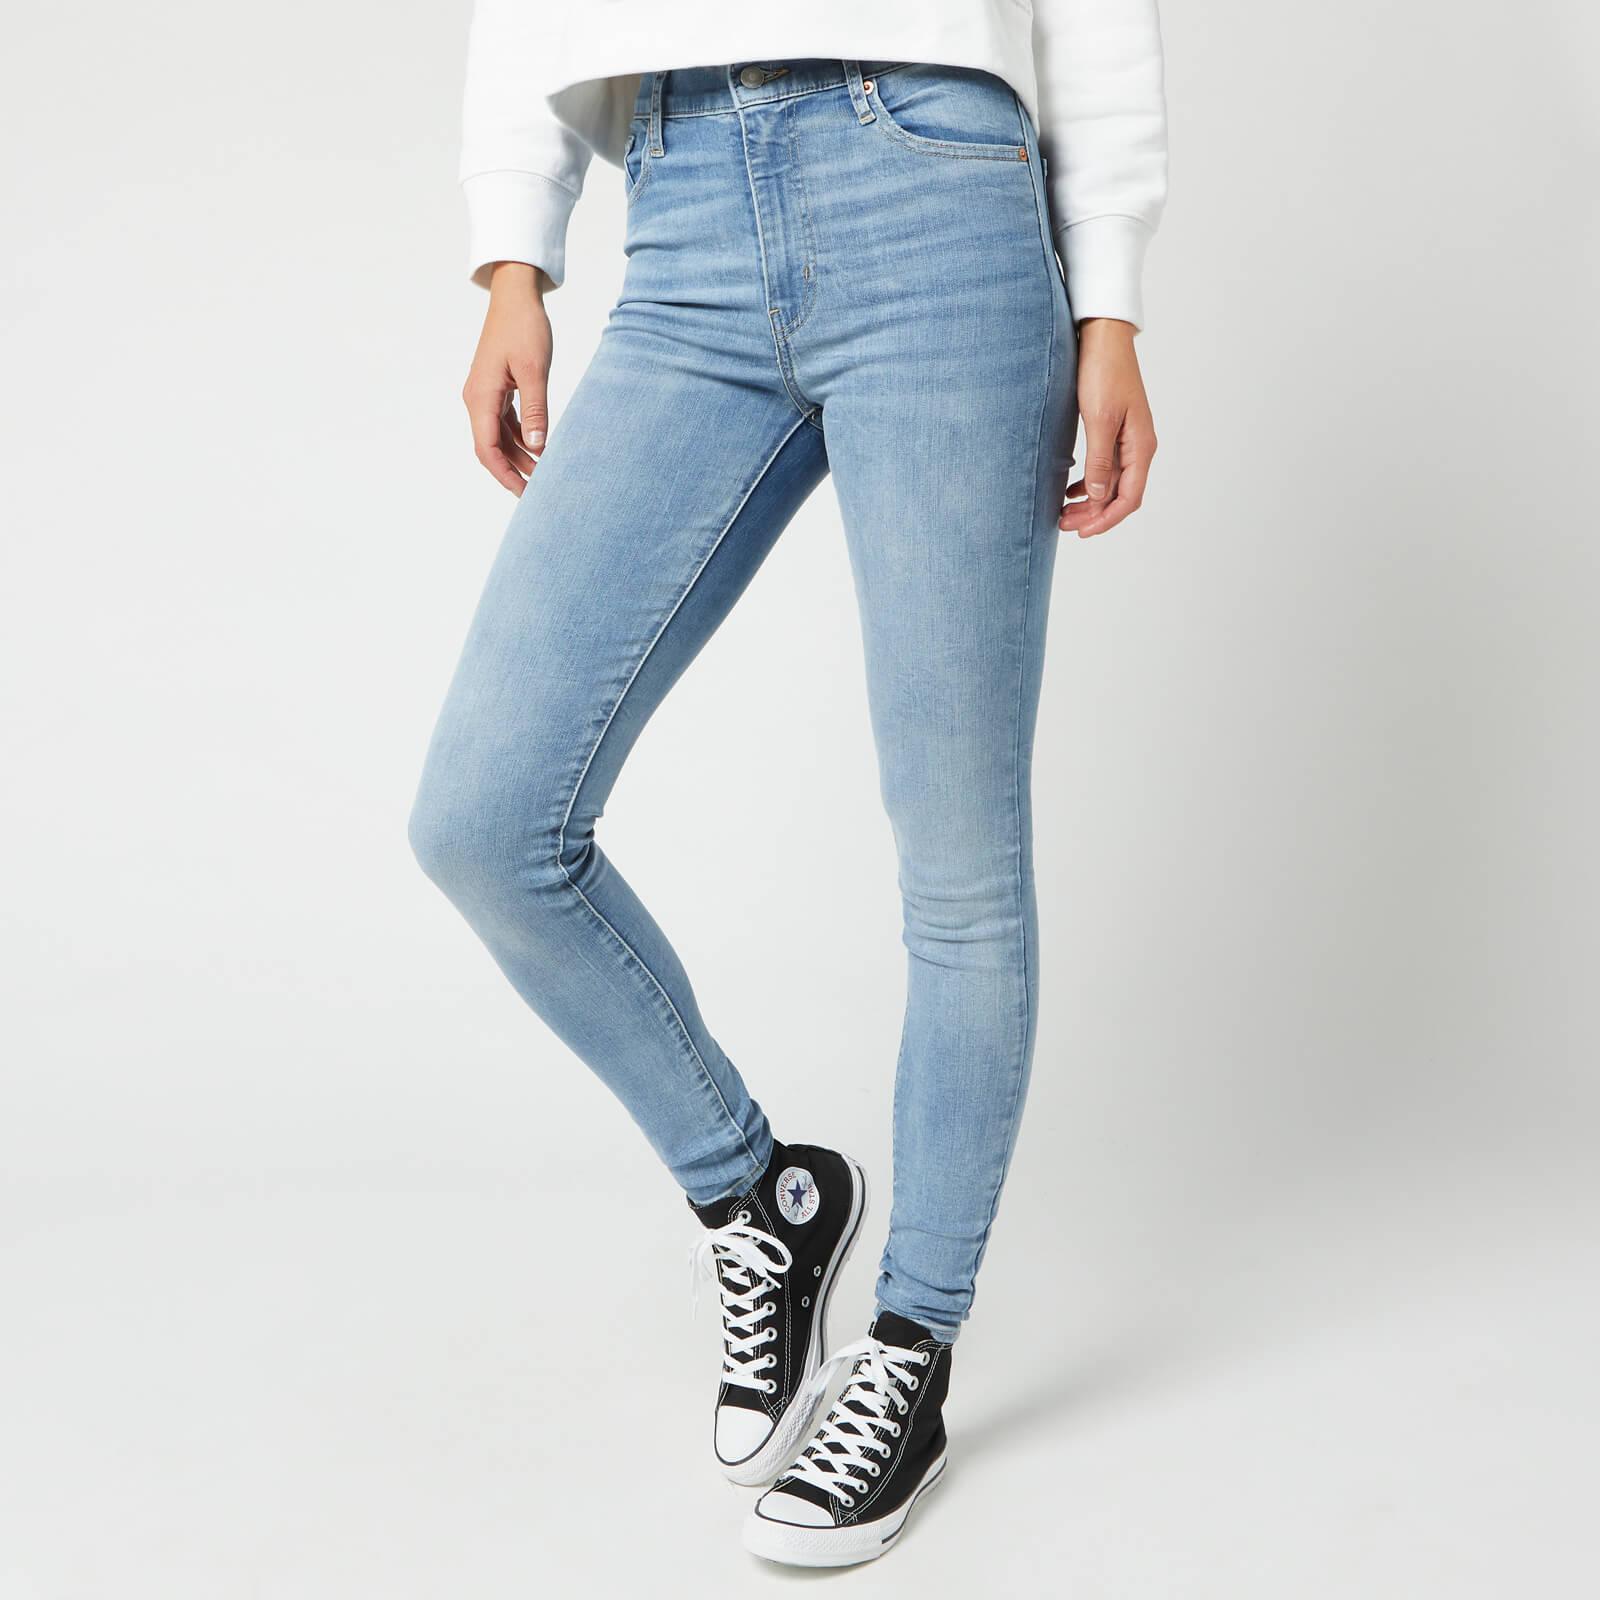 Levi's s Mile High Super Skinny Jeans - You Got Me - W27/L32